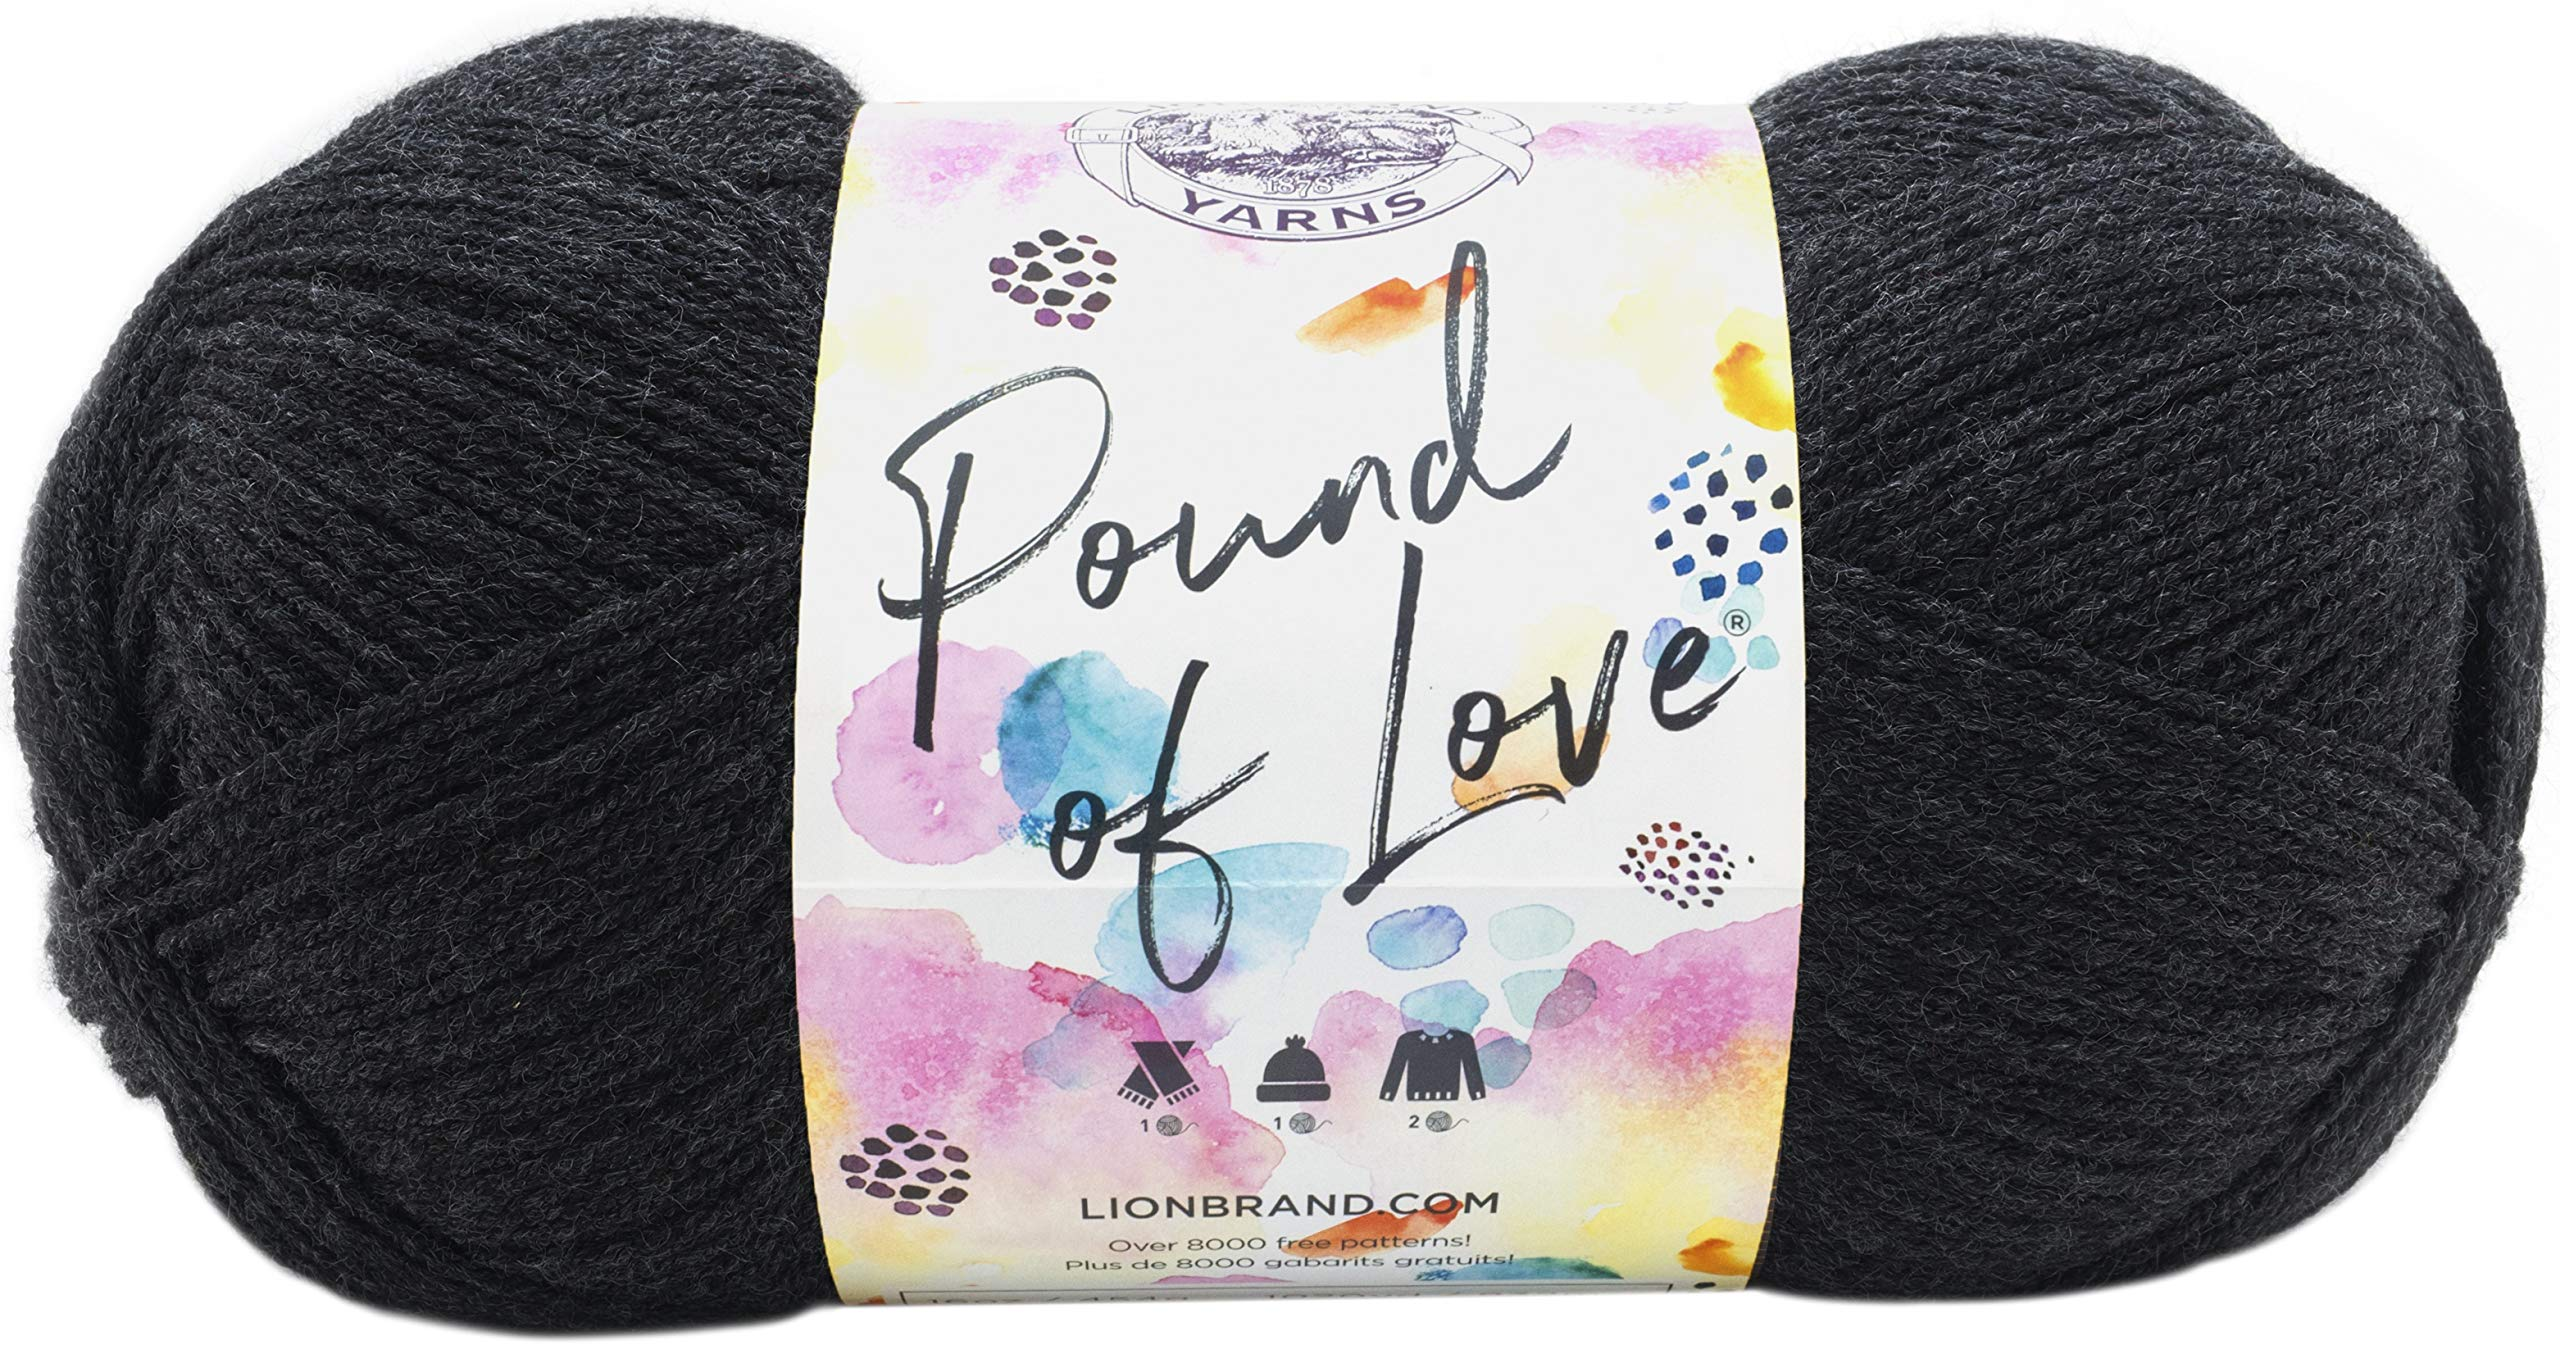 Lion Brand Yarn 550-149 Pound of Love Yarn, Charcoal